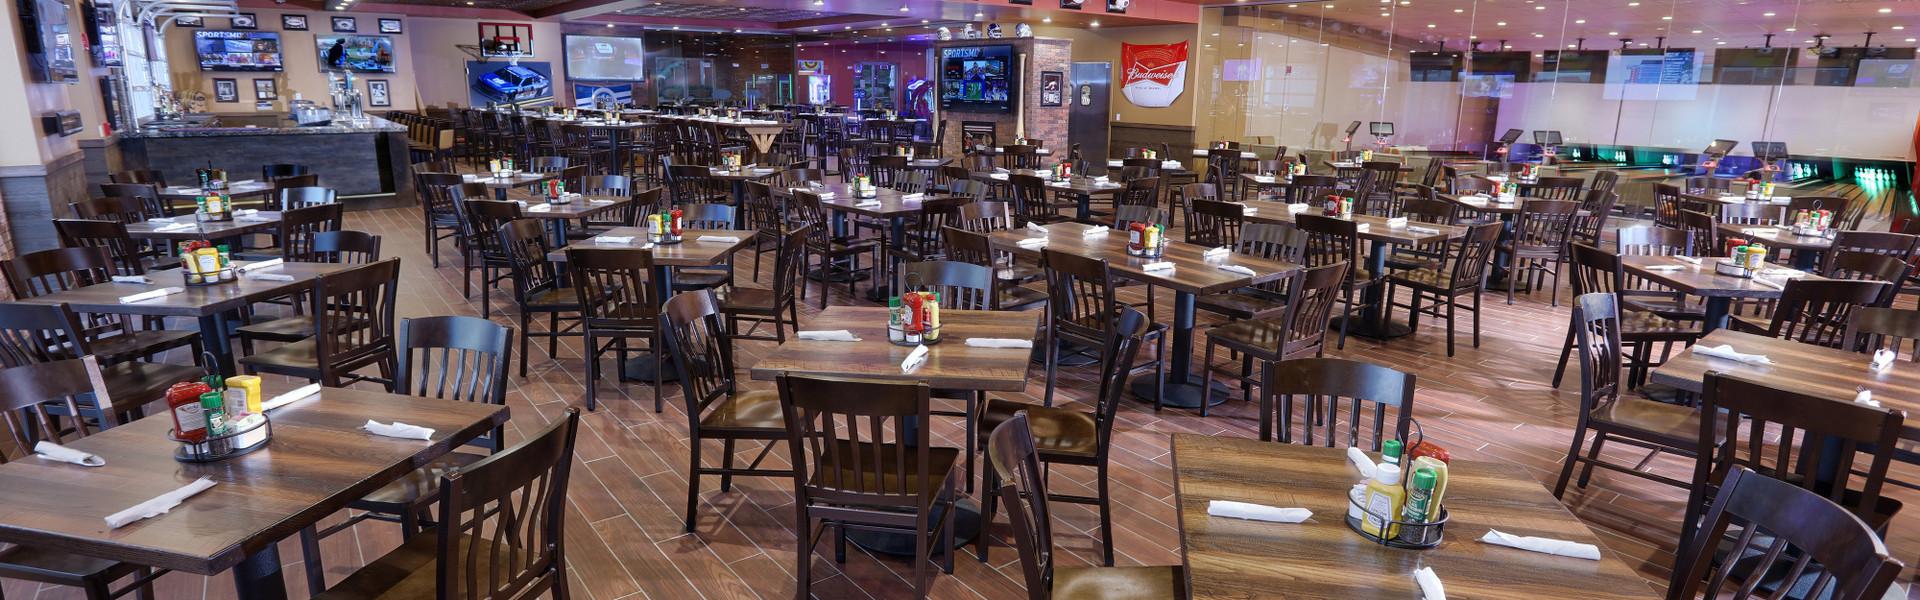 Inside one of our restaurants near Westgate Resort Orlando | Restaurants near Turkey Lake Road | Westgate Lakes Resort & Spa